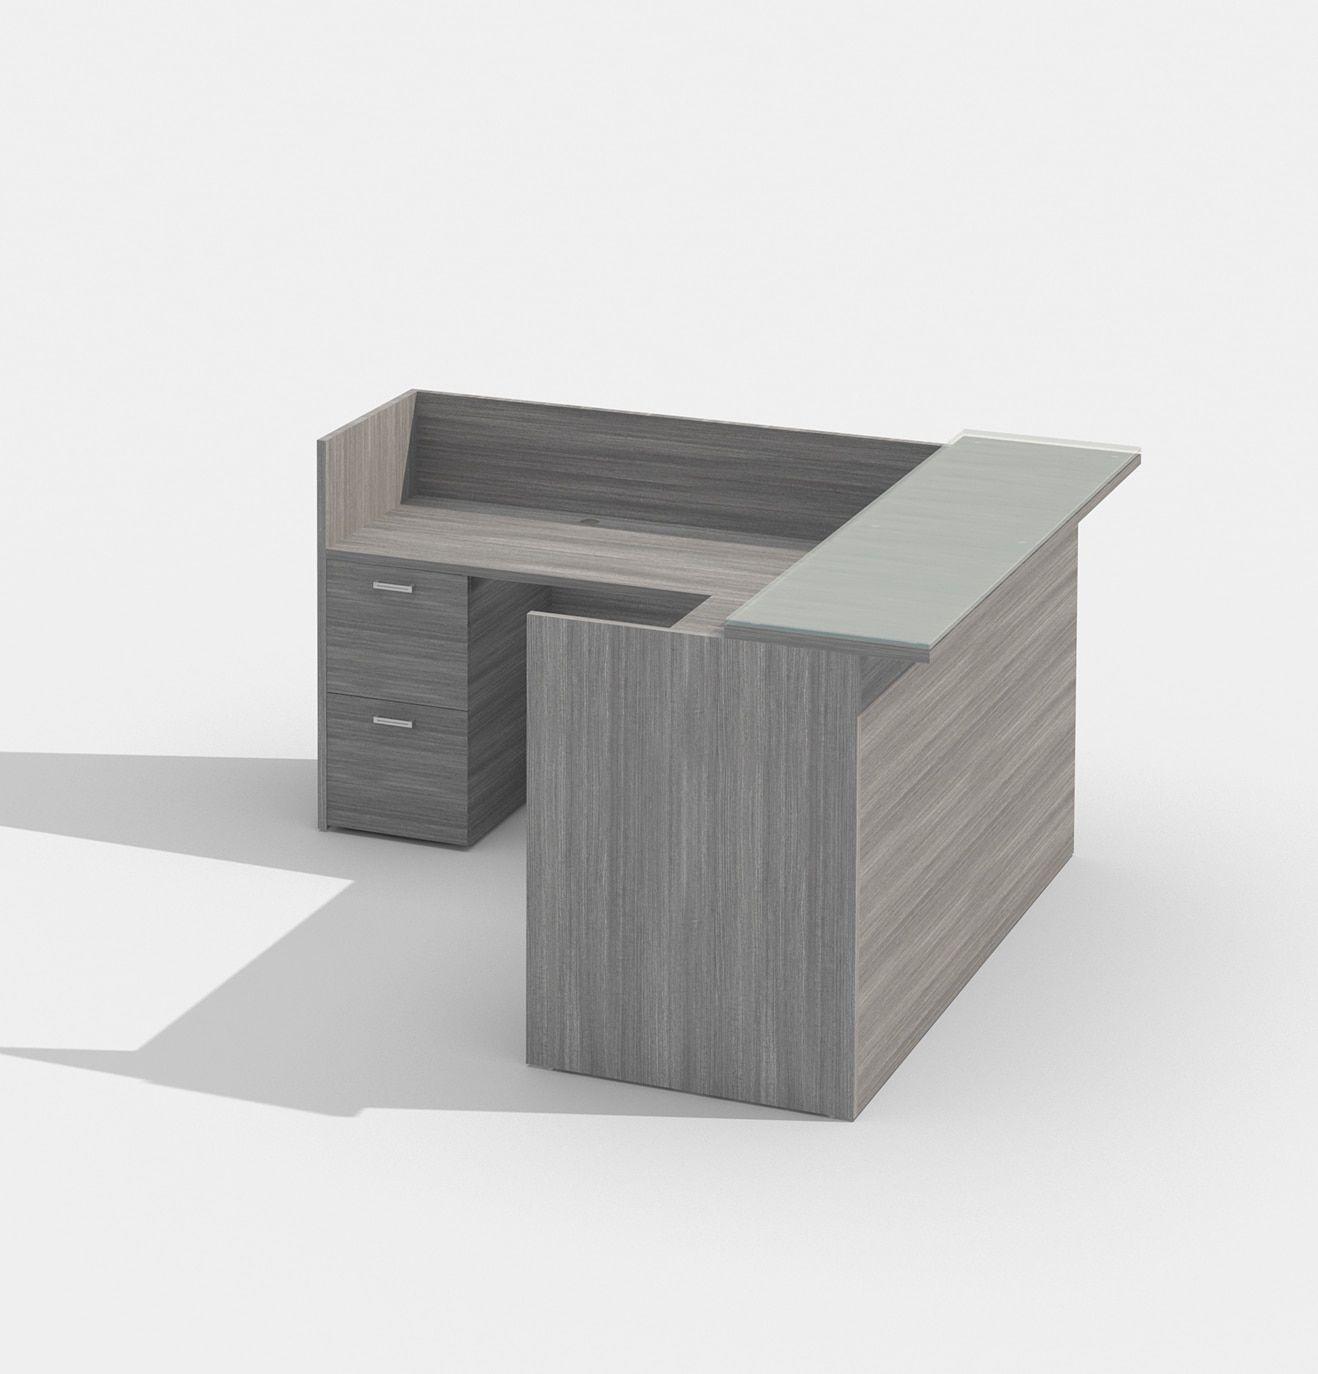 Cherryman Amber Series Am 400n Reception Desk With Glass Transaction Top Small Reception Desk Reception Desk Reception Desk Design